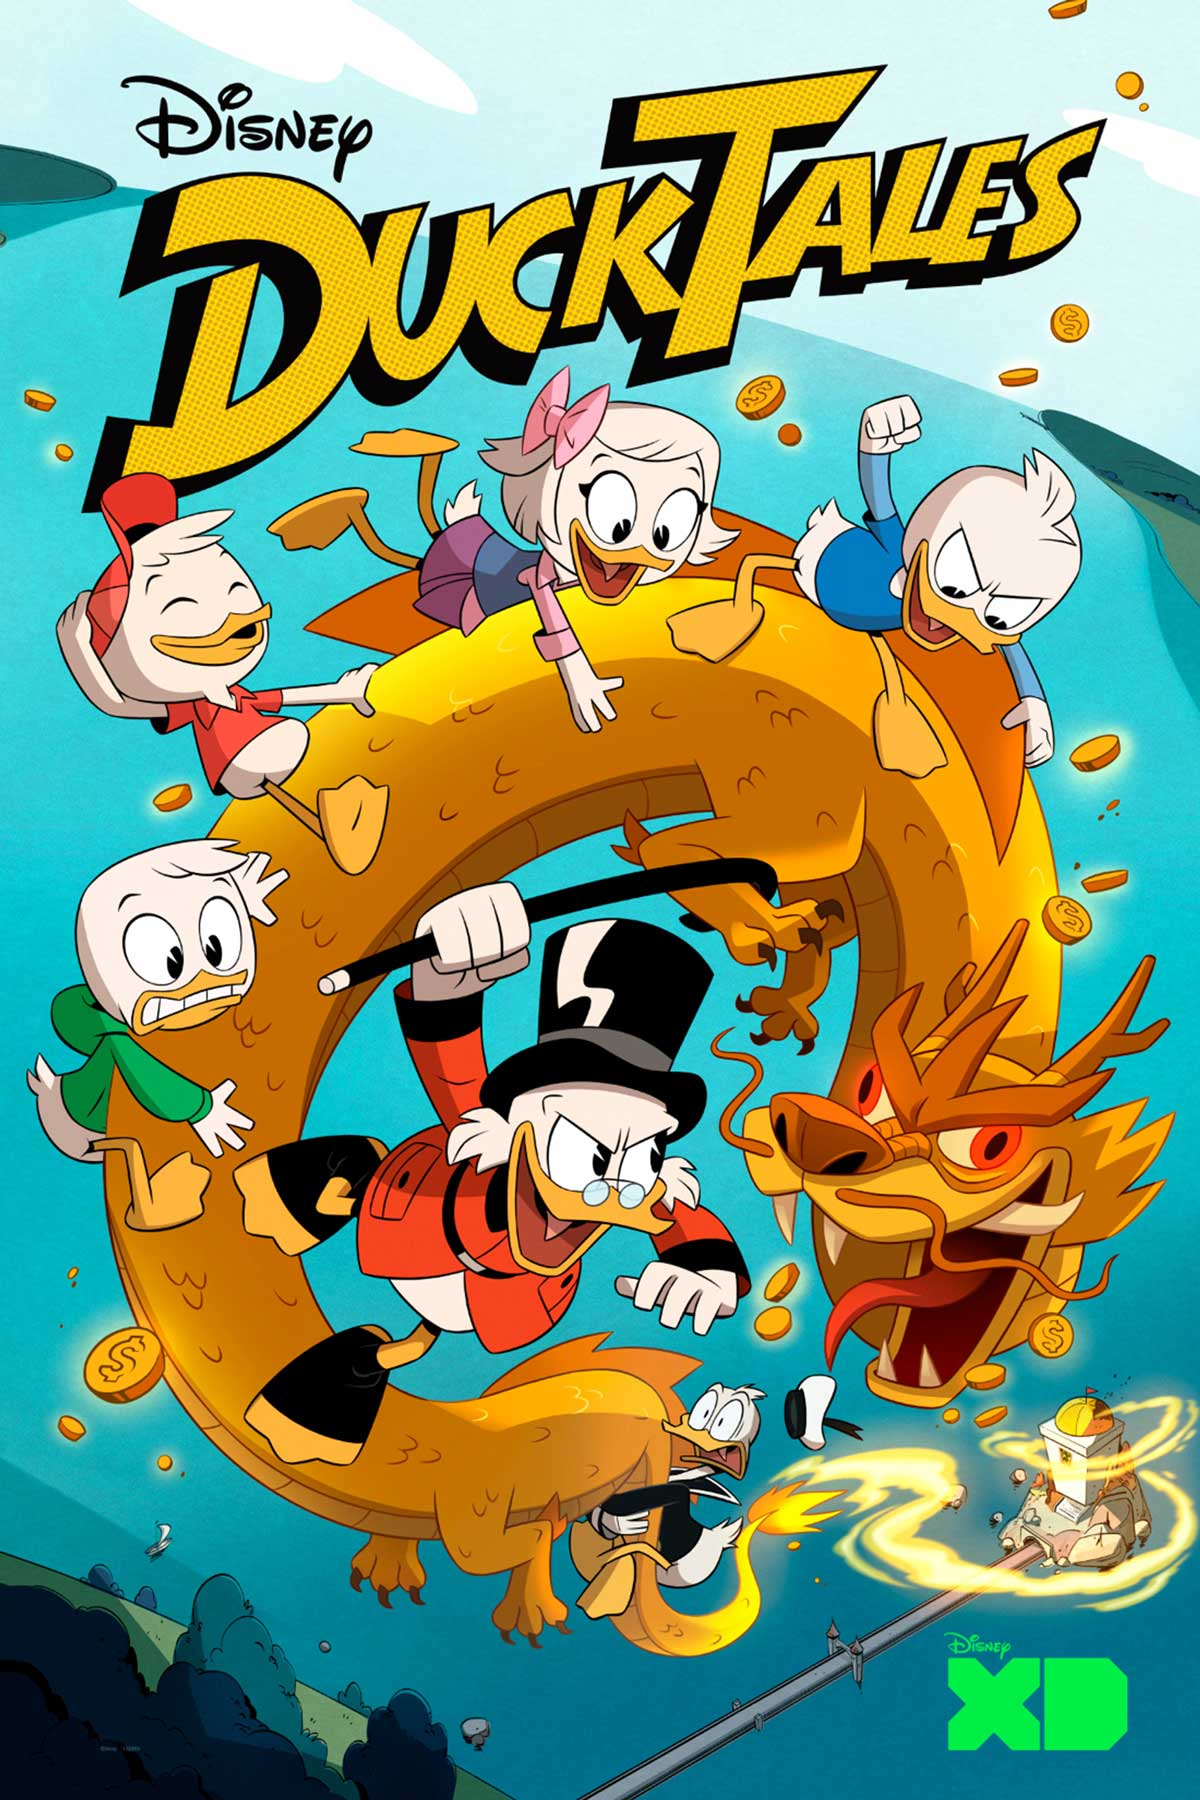 affiche bande picsou atlantide poster disney ducktales woo-oo